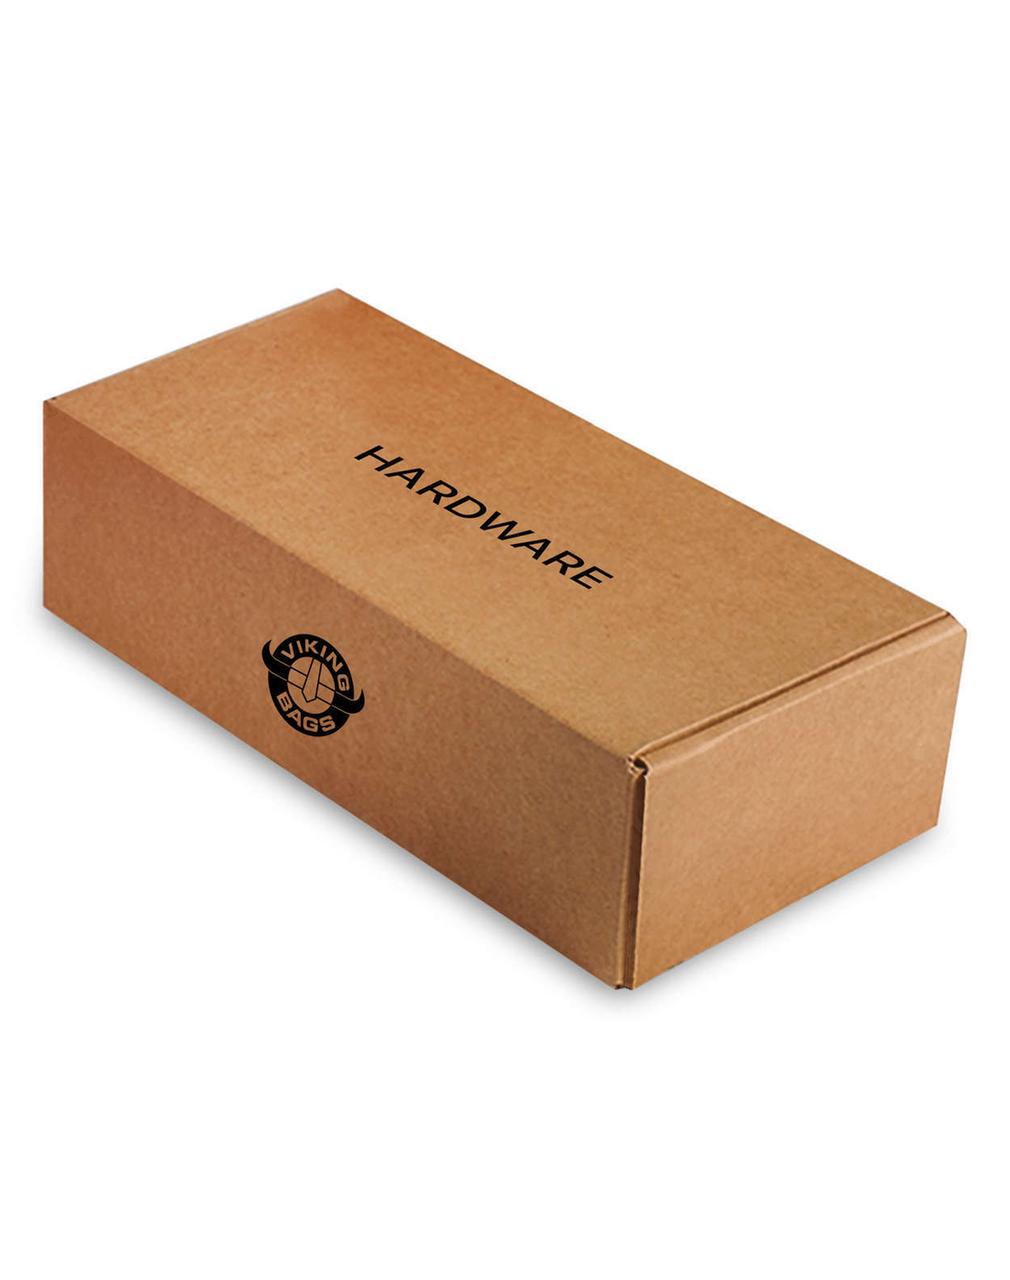 Honda 600 Shadow VLX Uni SS Side Pocket Studded Motorcycle Saddlebags box